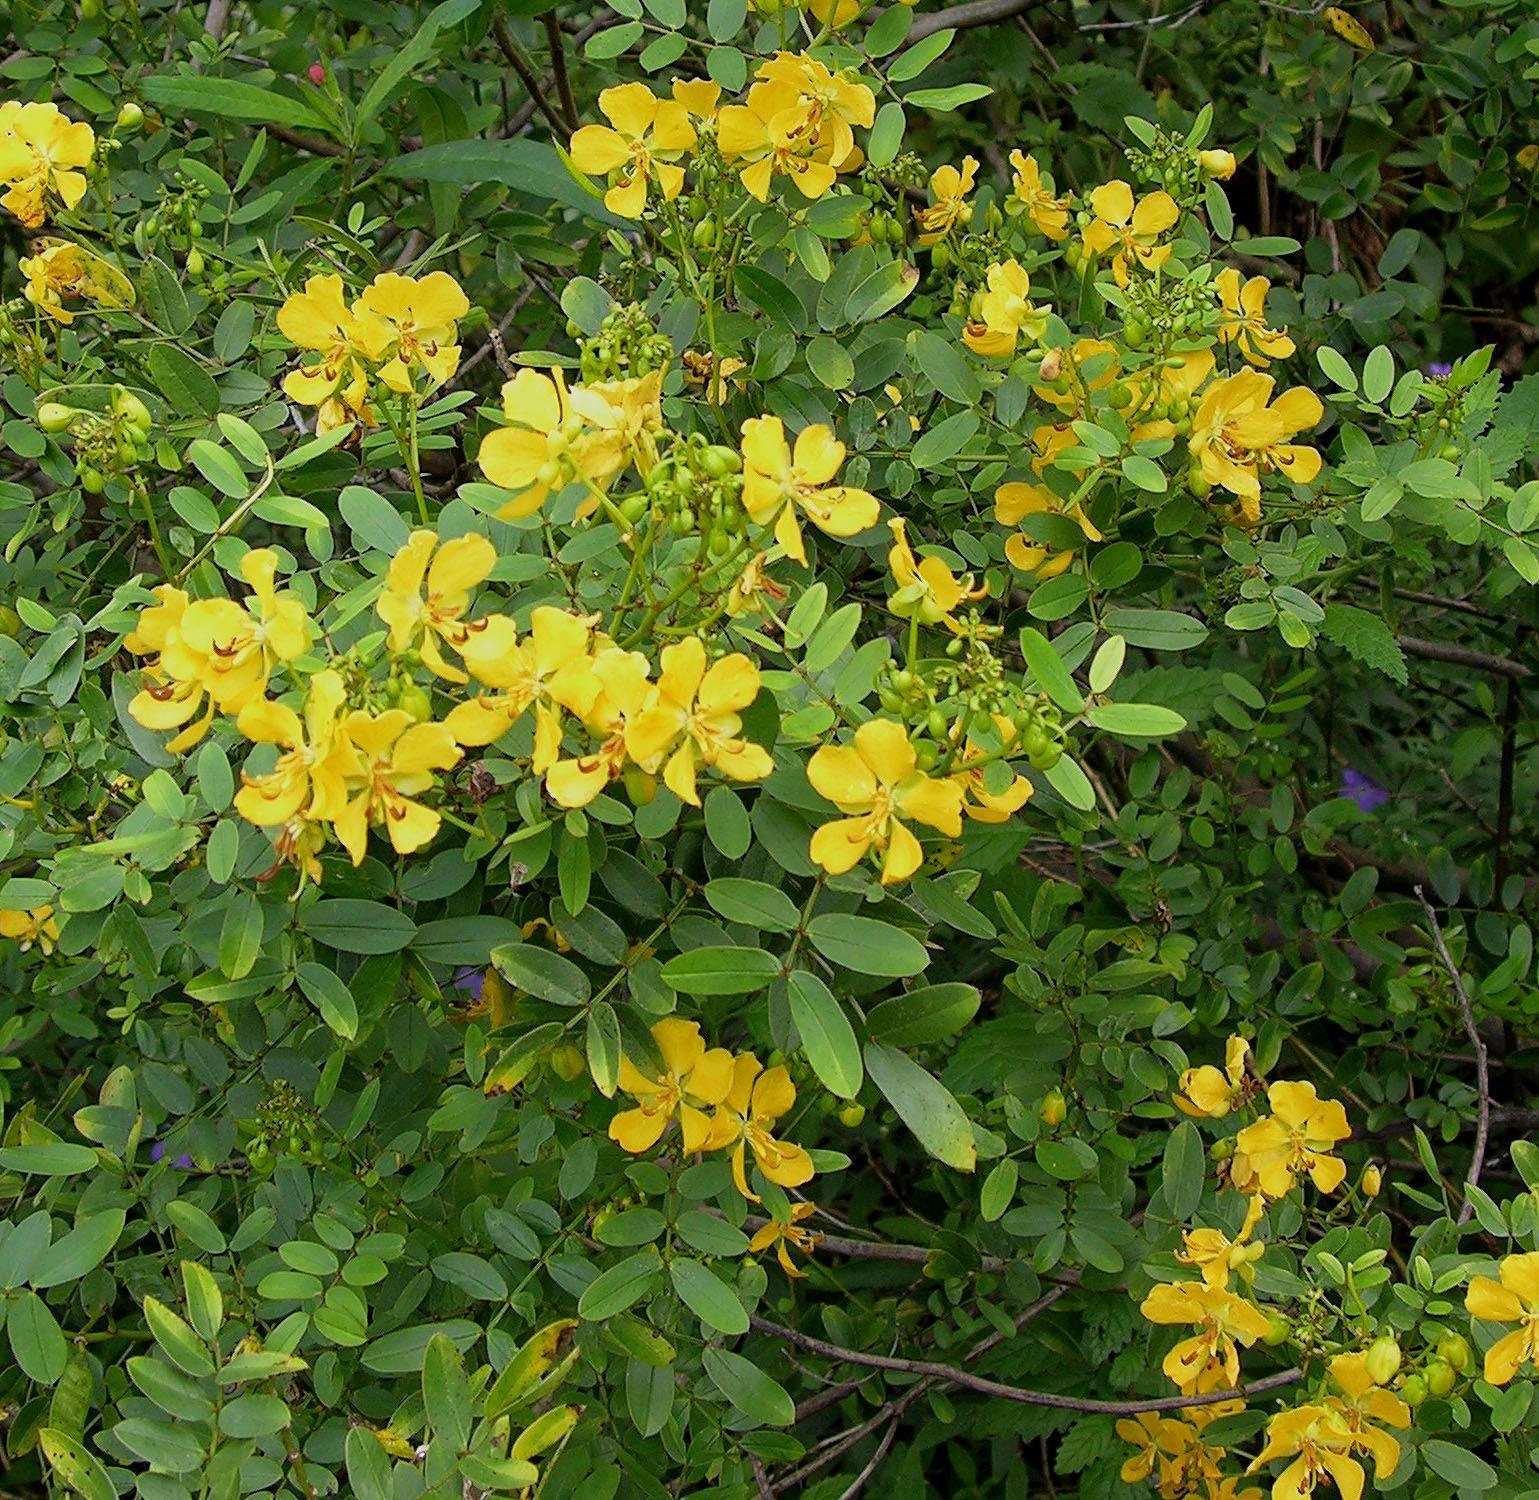 Fairchild tropical botanic garden home gardening